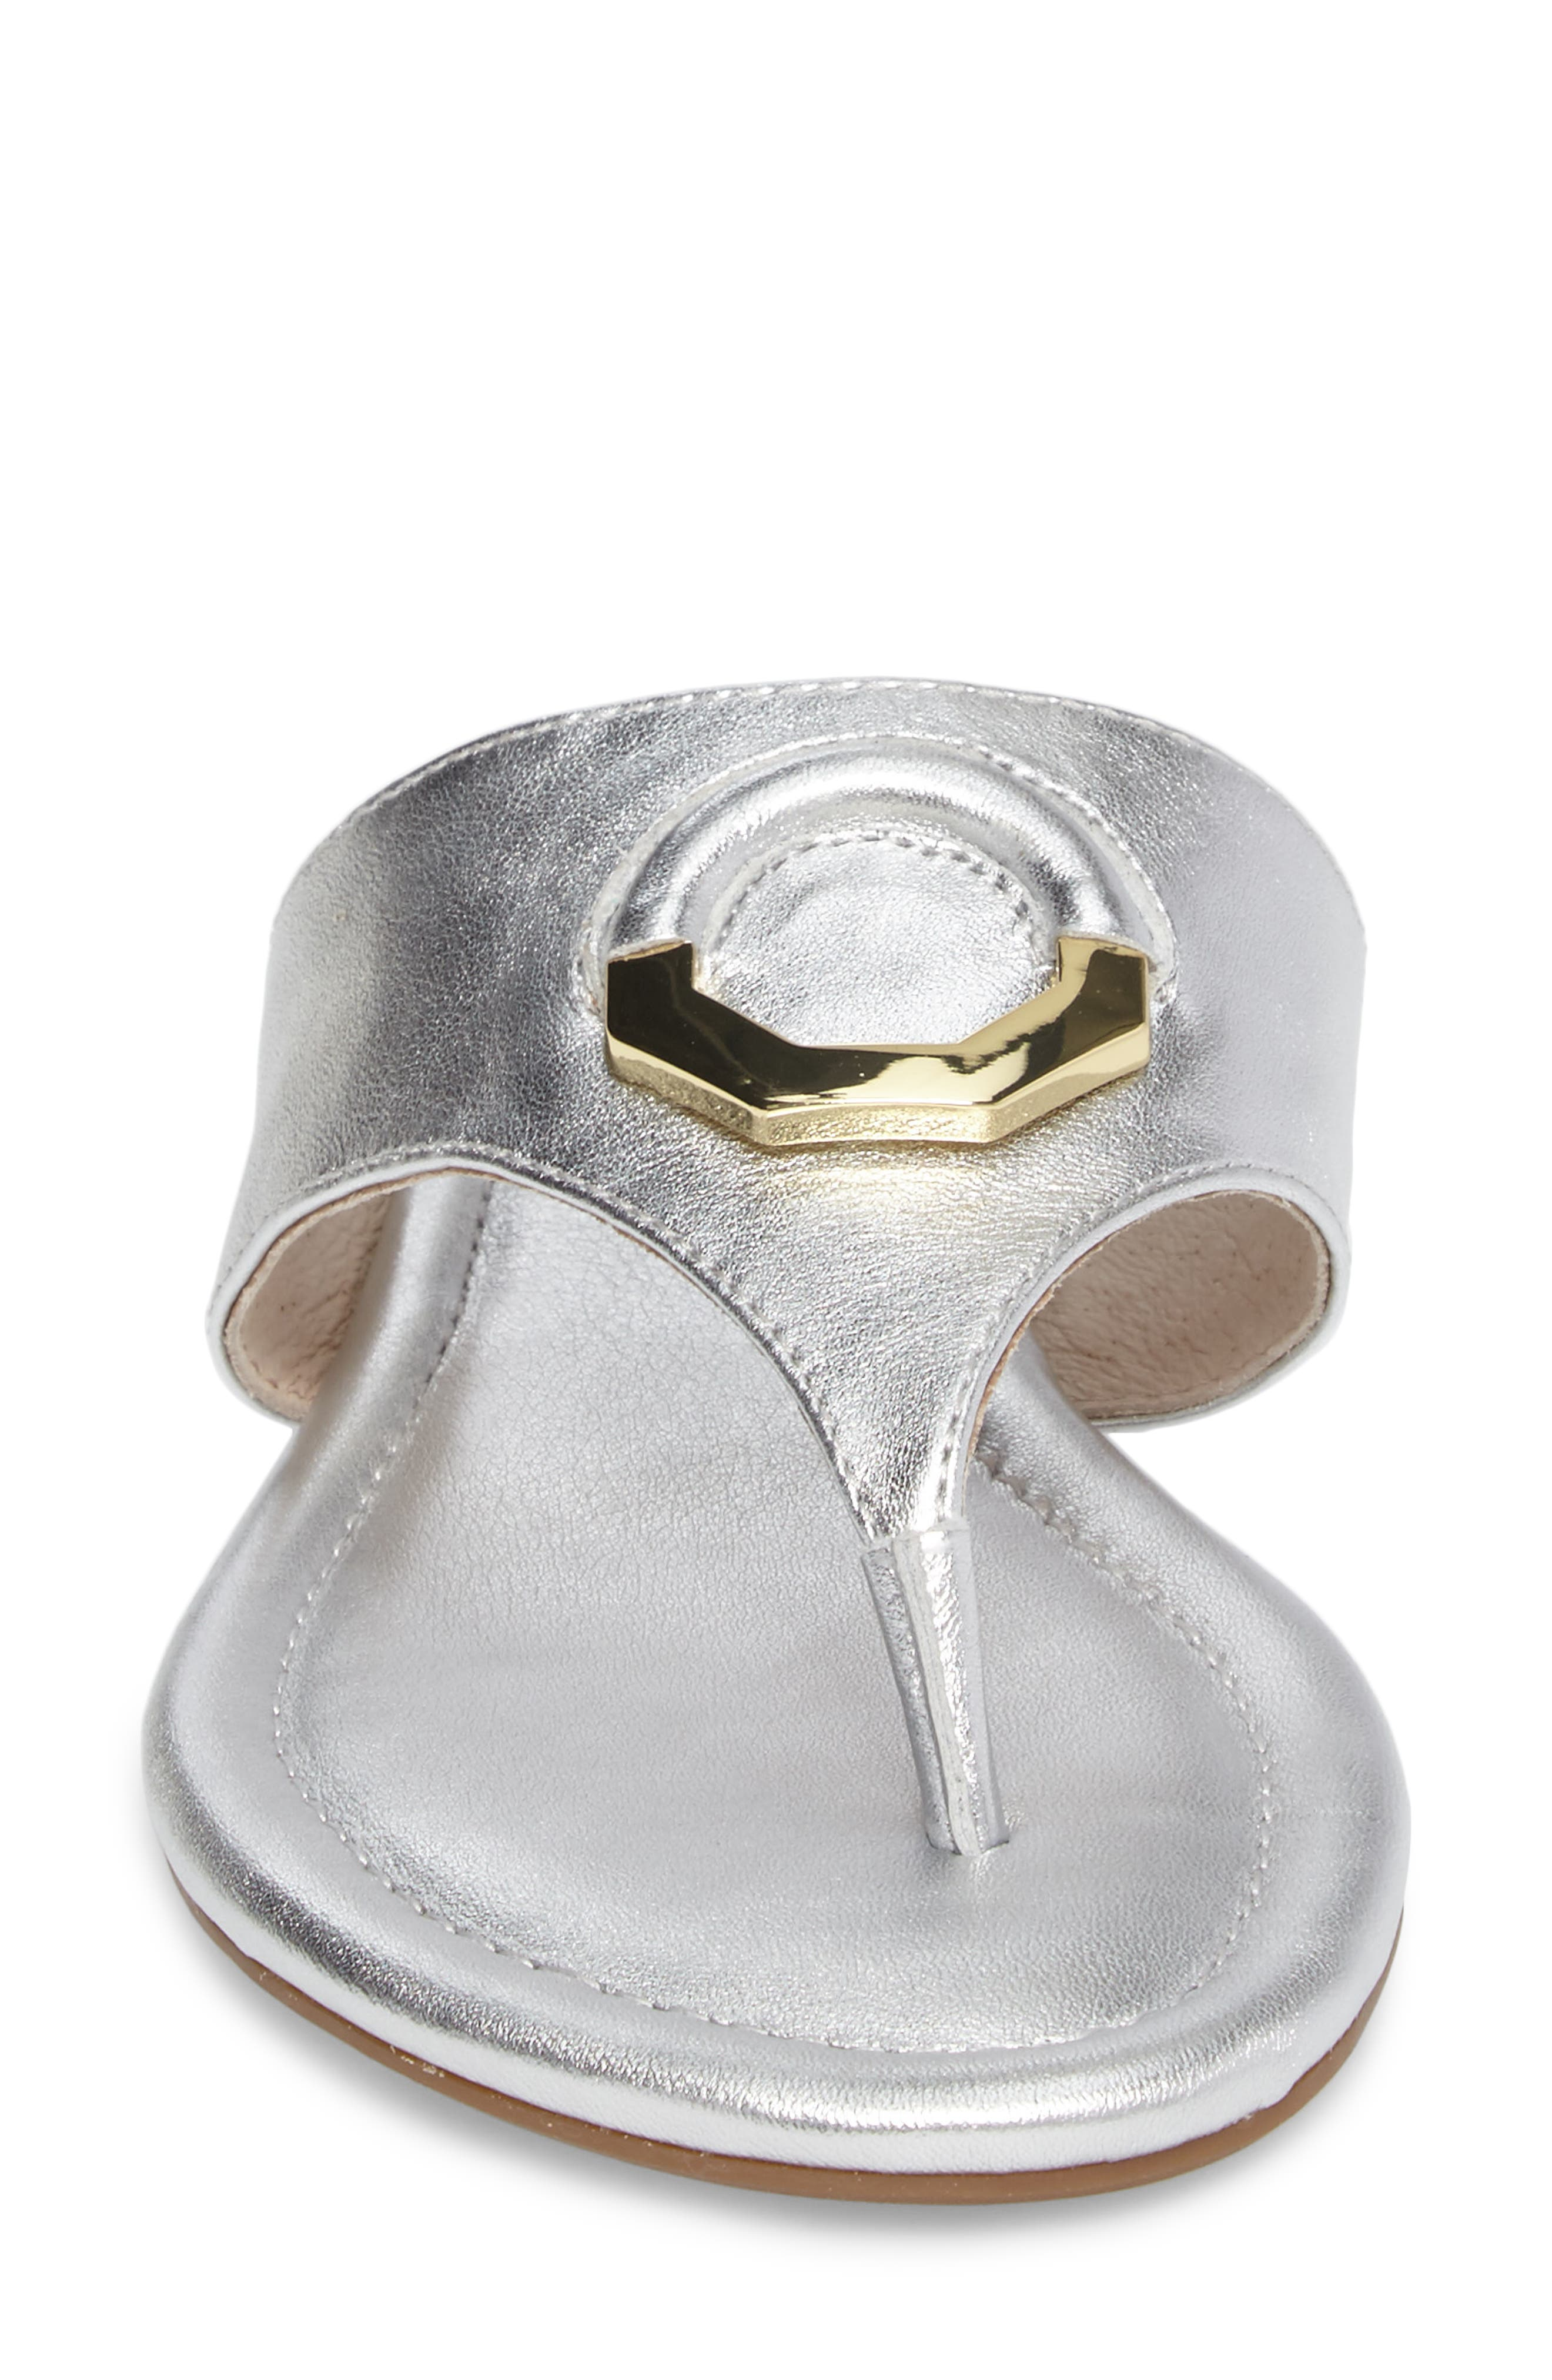 Adana Flip Flop,                             Alternate thumbnail 4, color,                             Sterling Leather